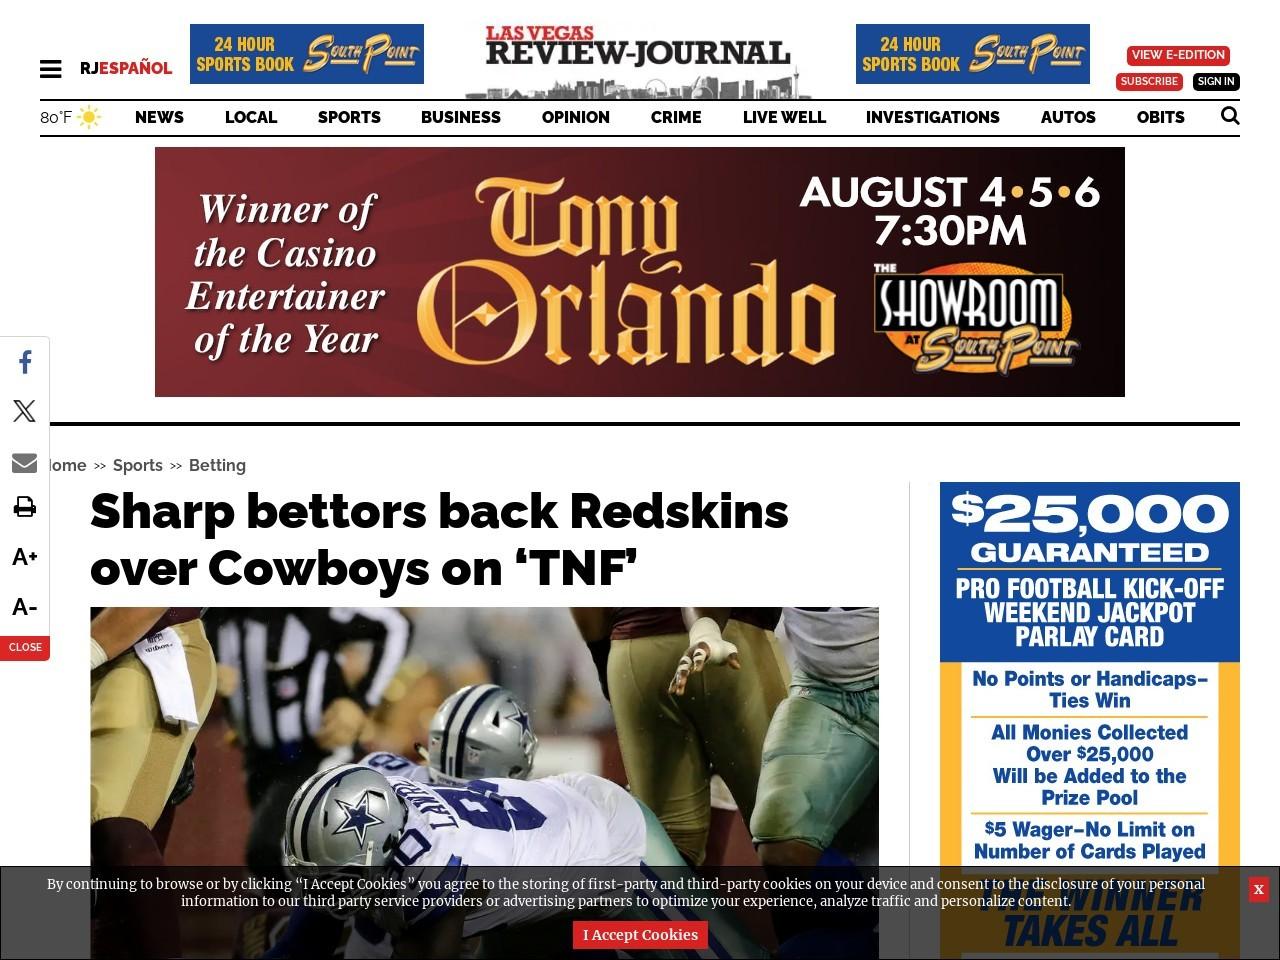 Sharp bettors back Redskins over Cowboys on 'TNF'